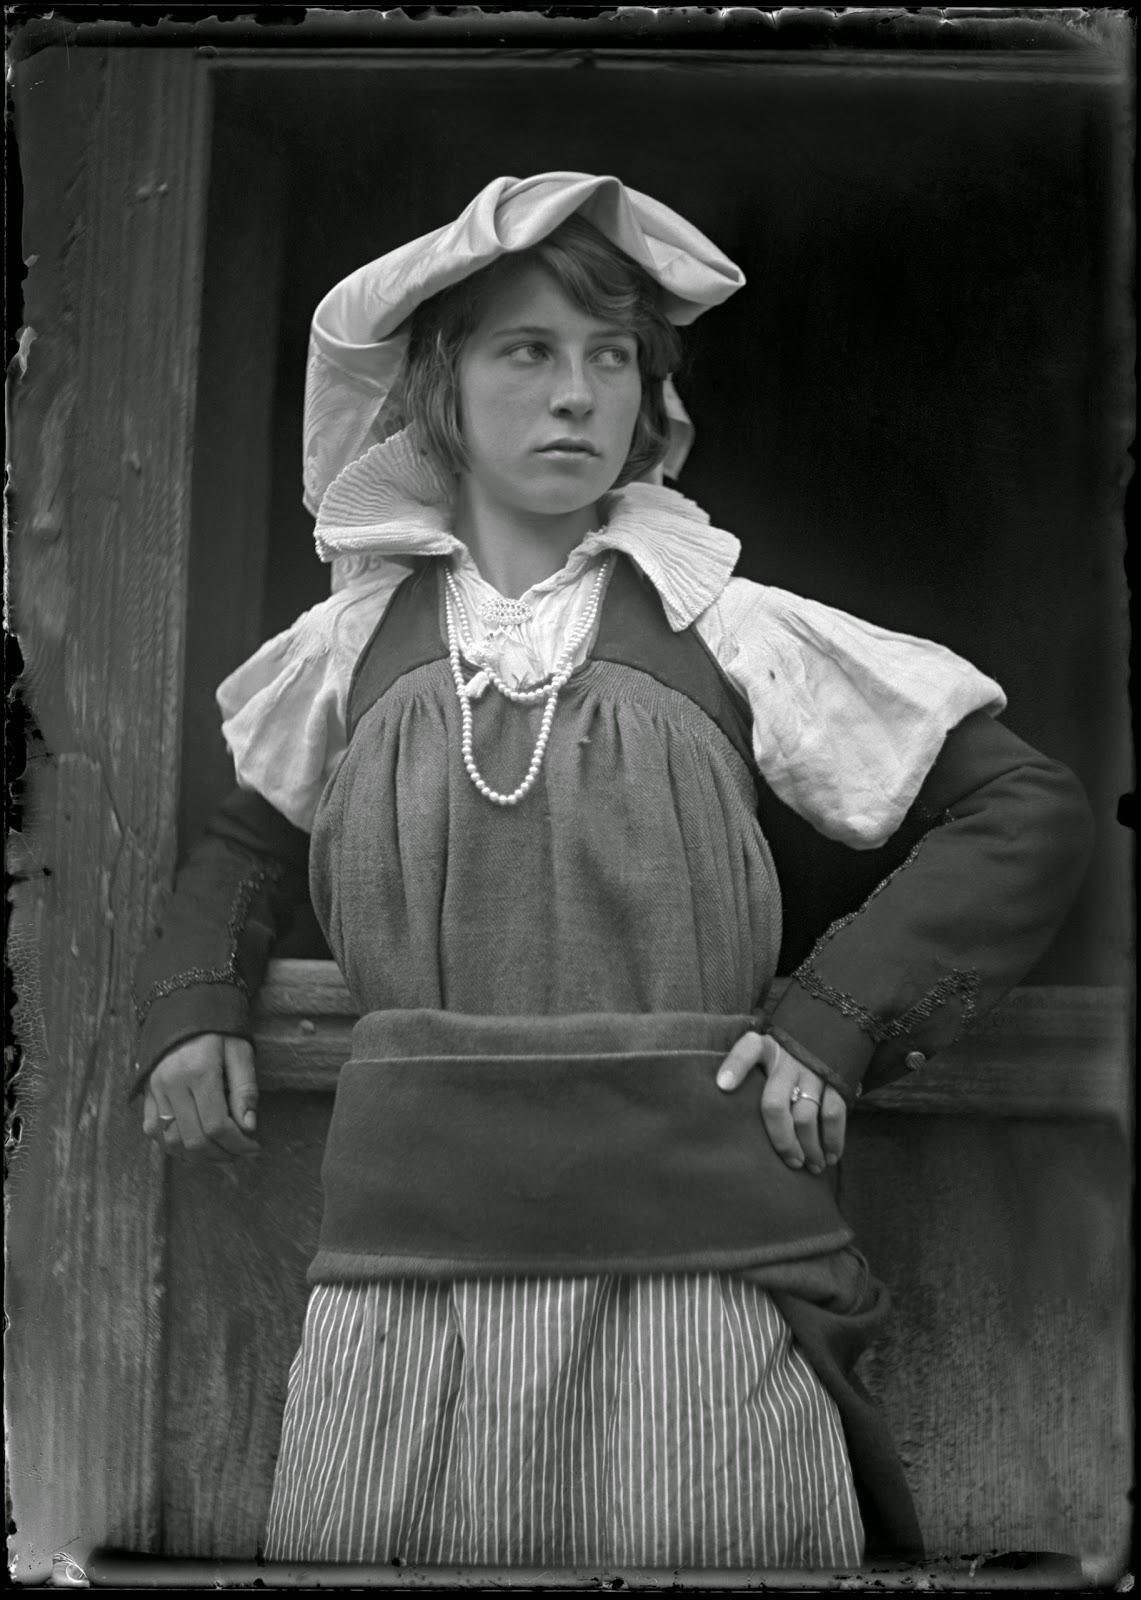 joven mujer pirineo foto antigua